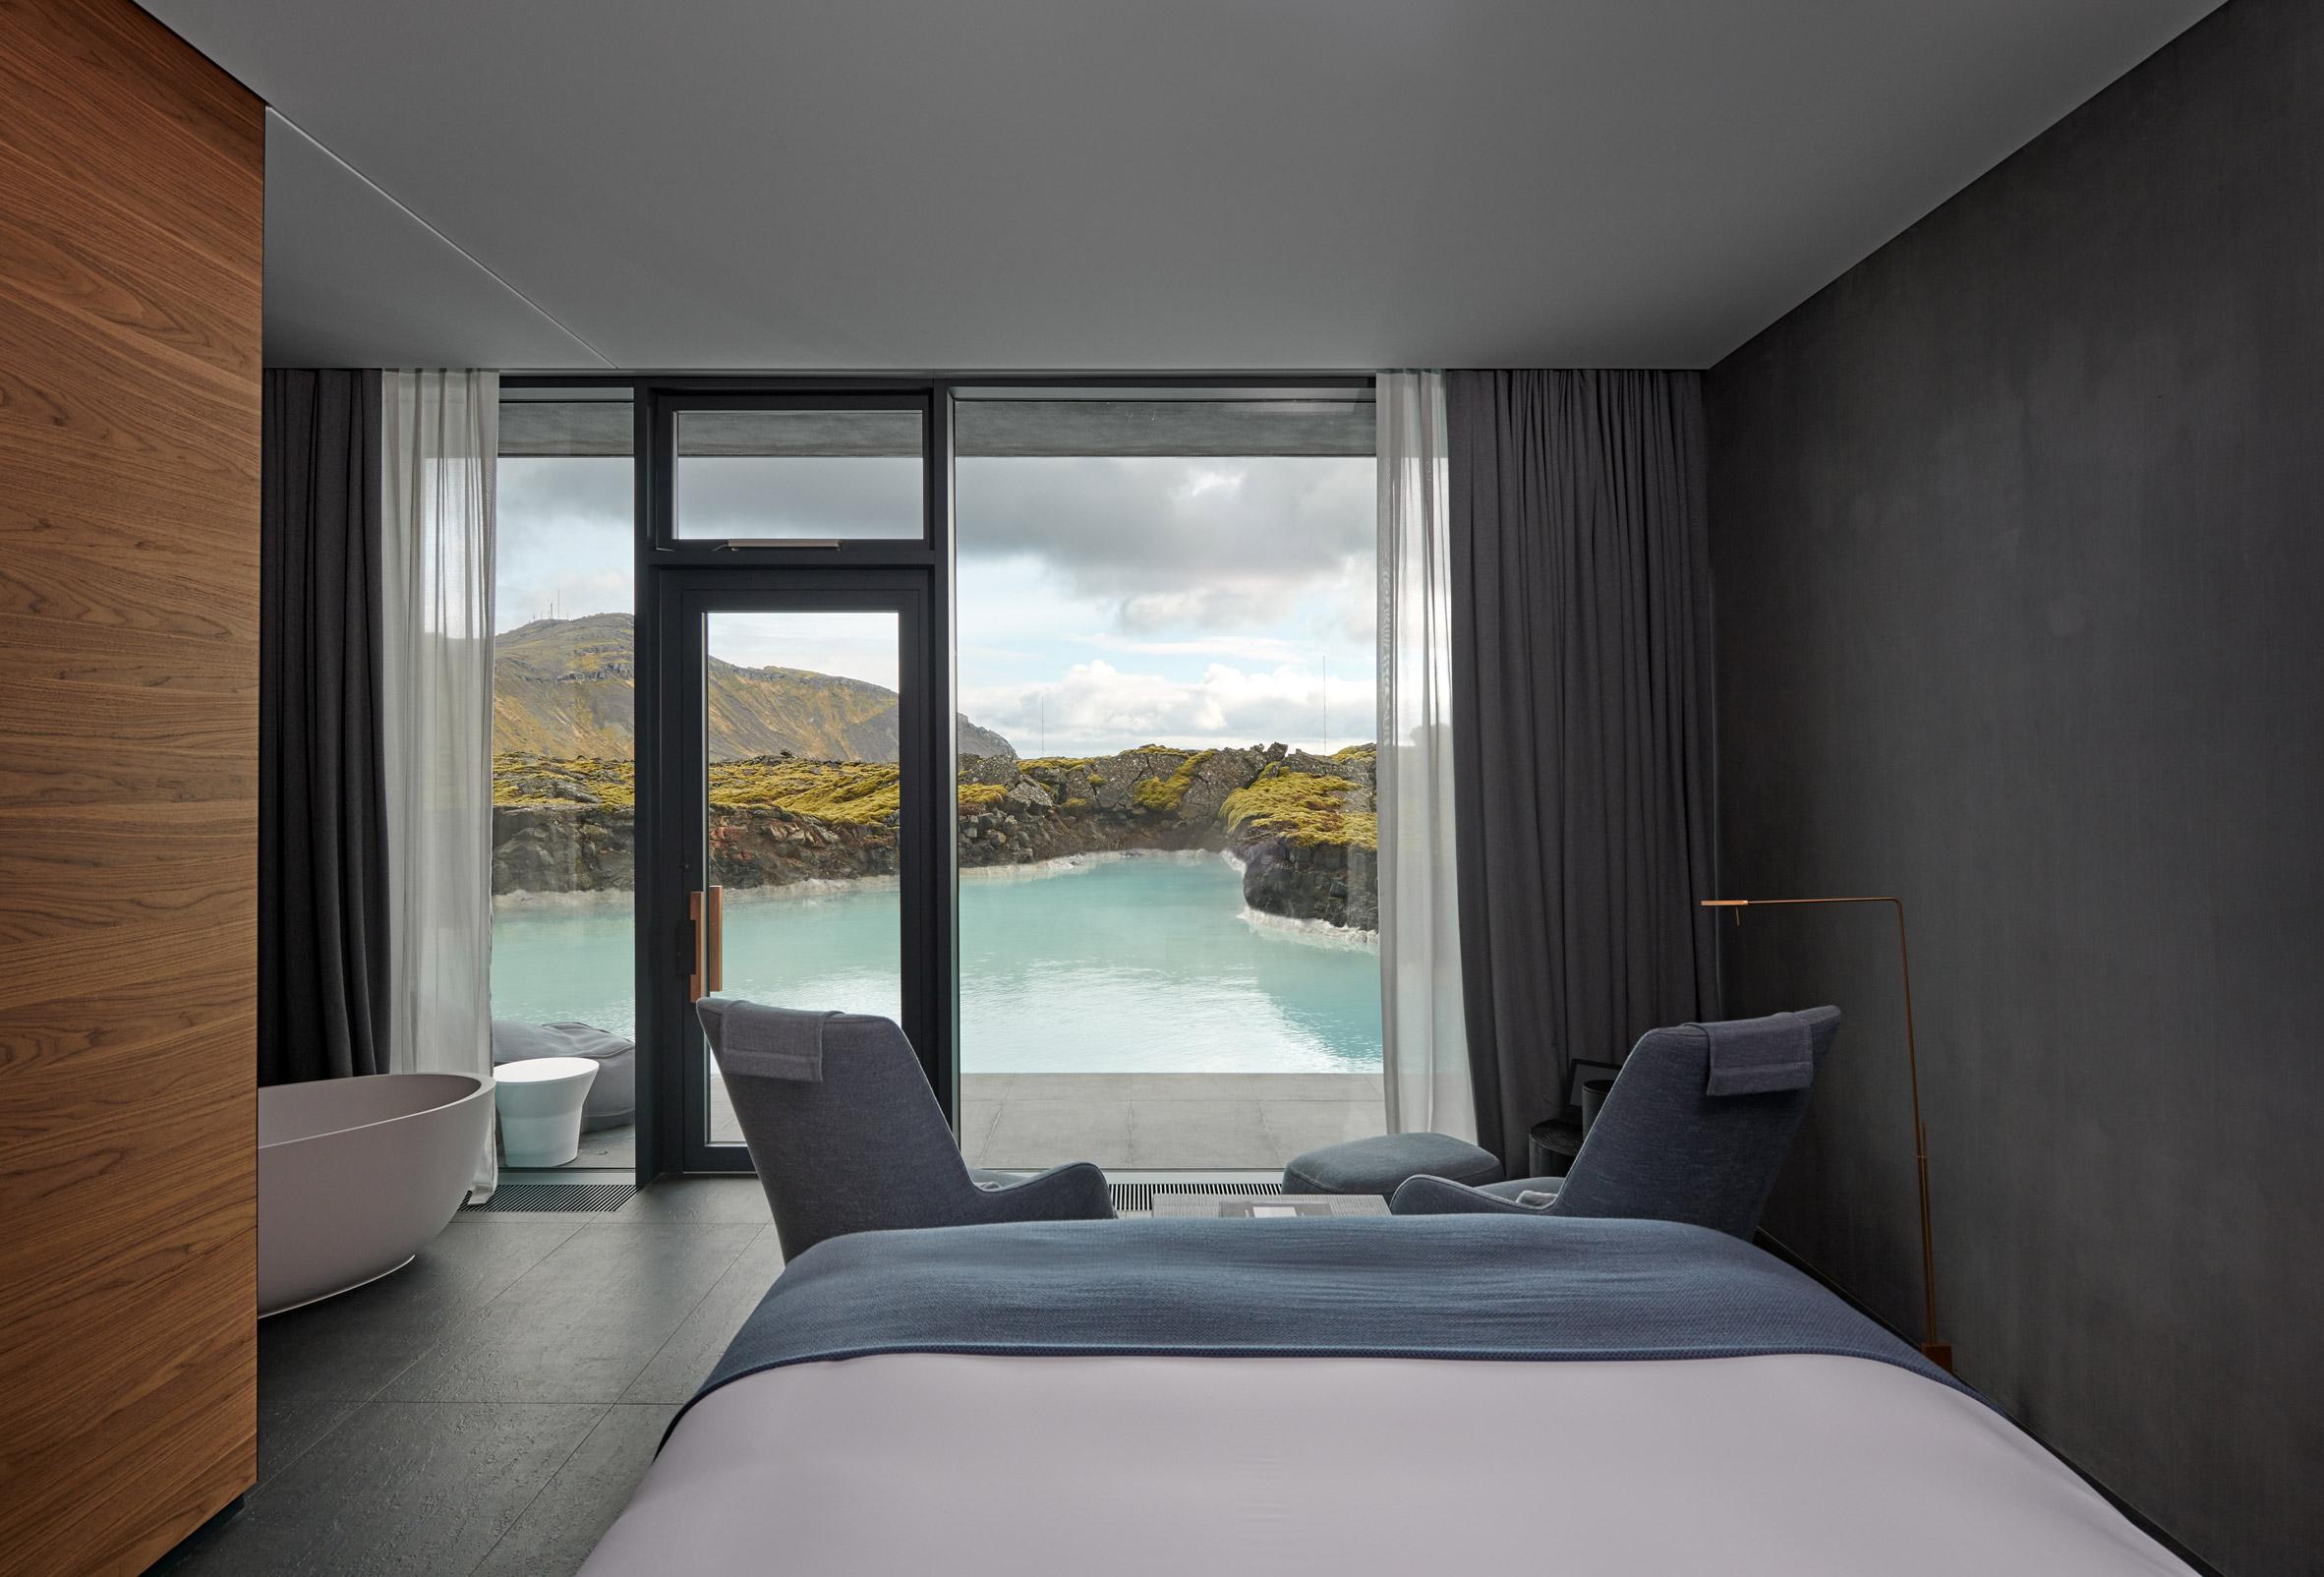 Thiết kế nội thất Resort 6